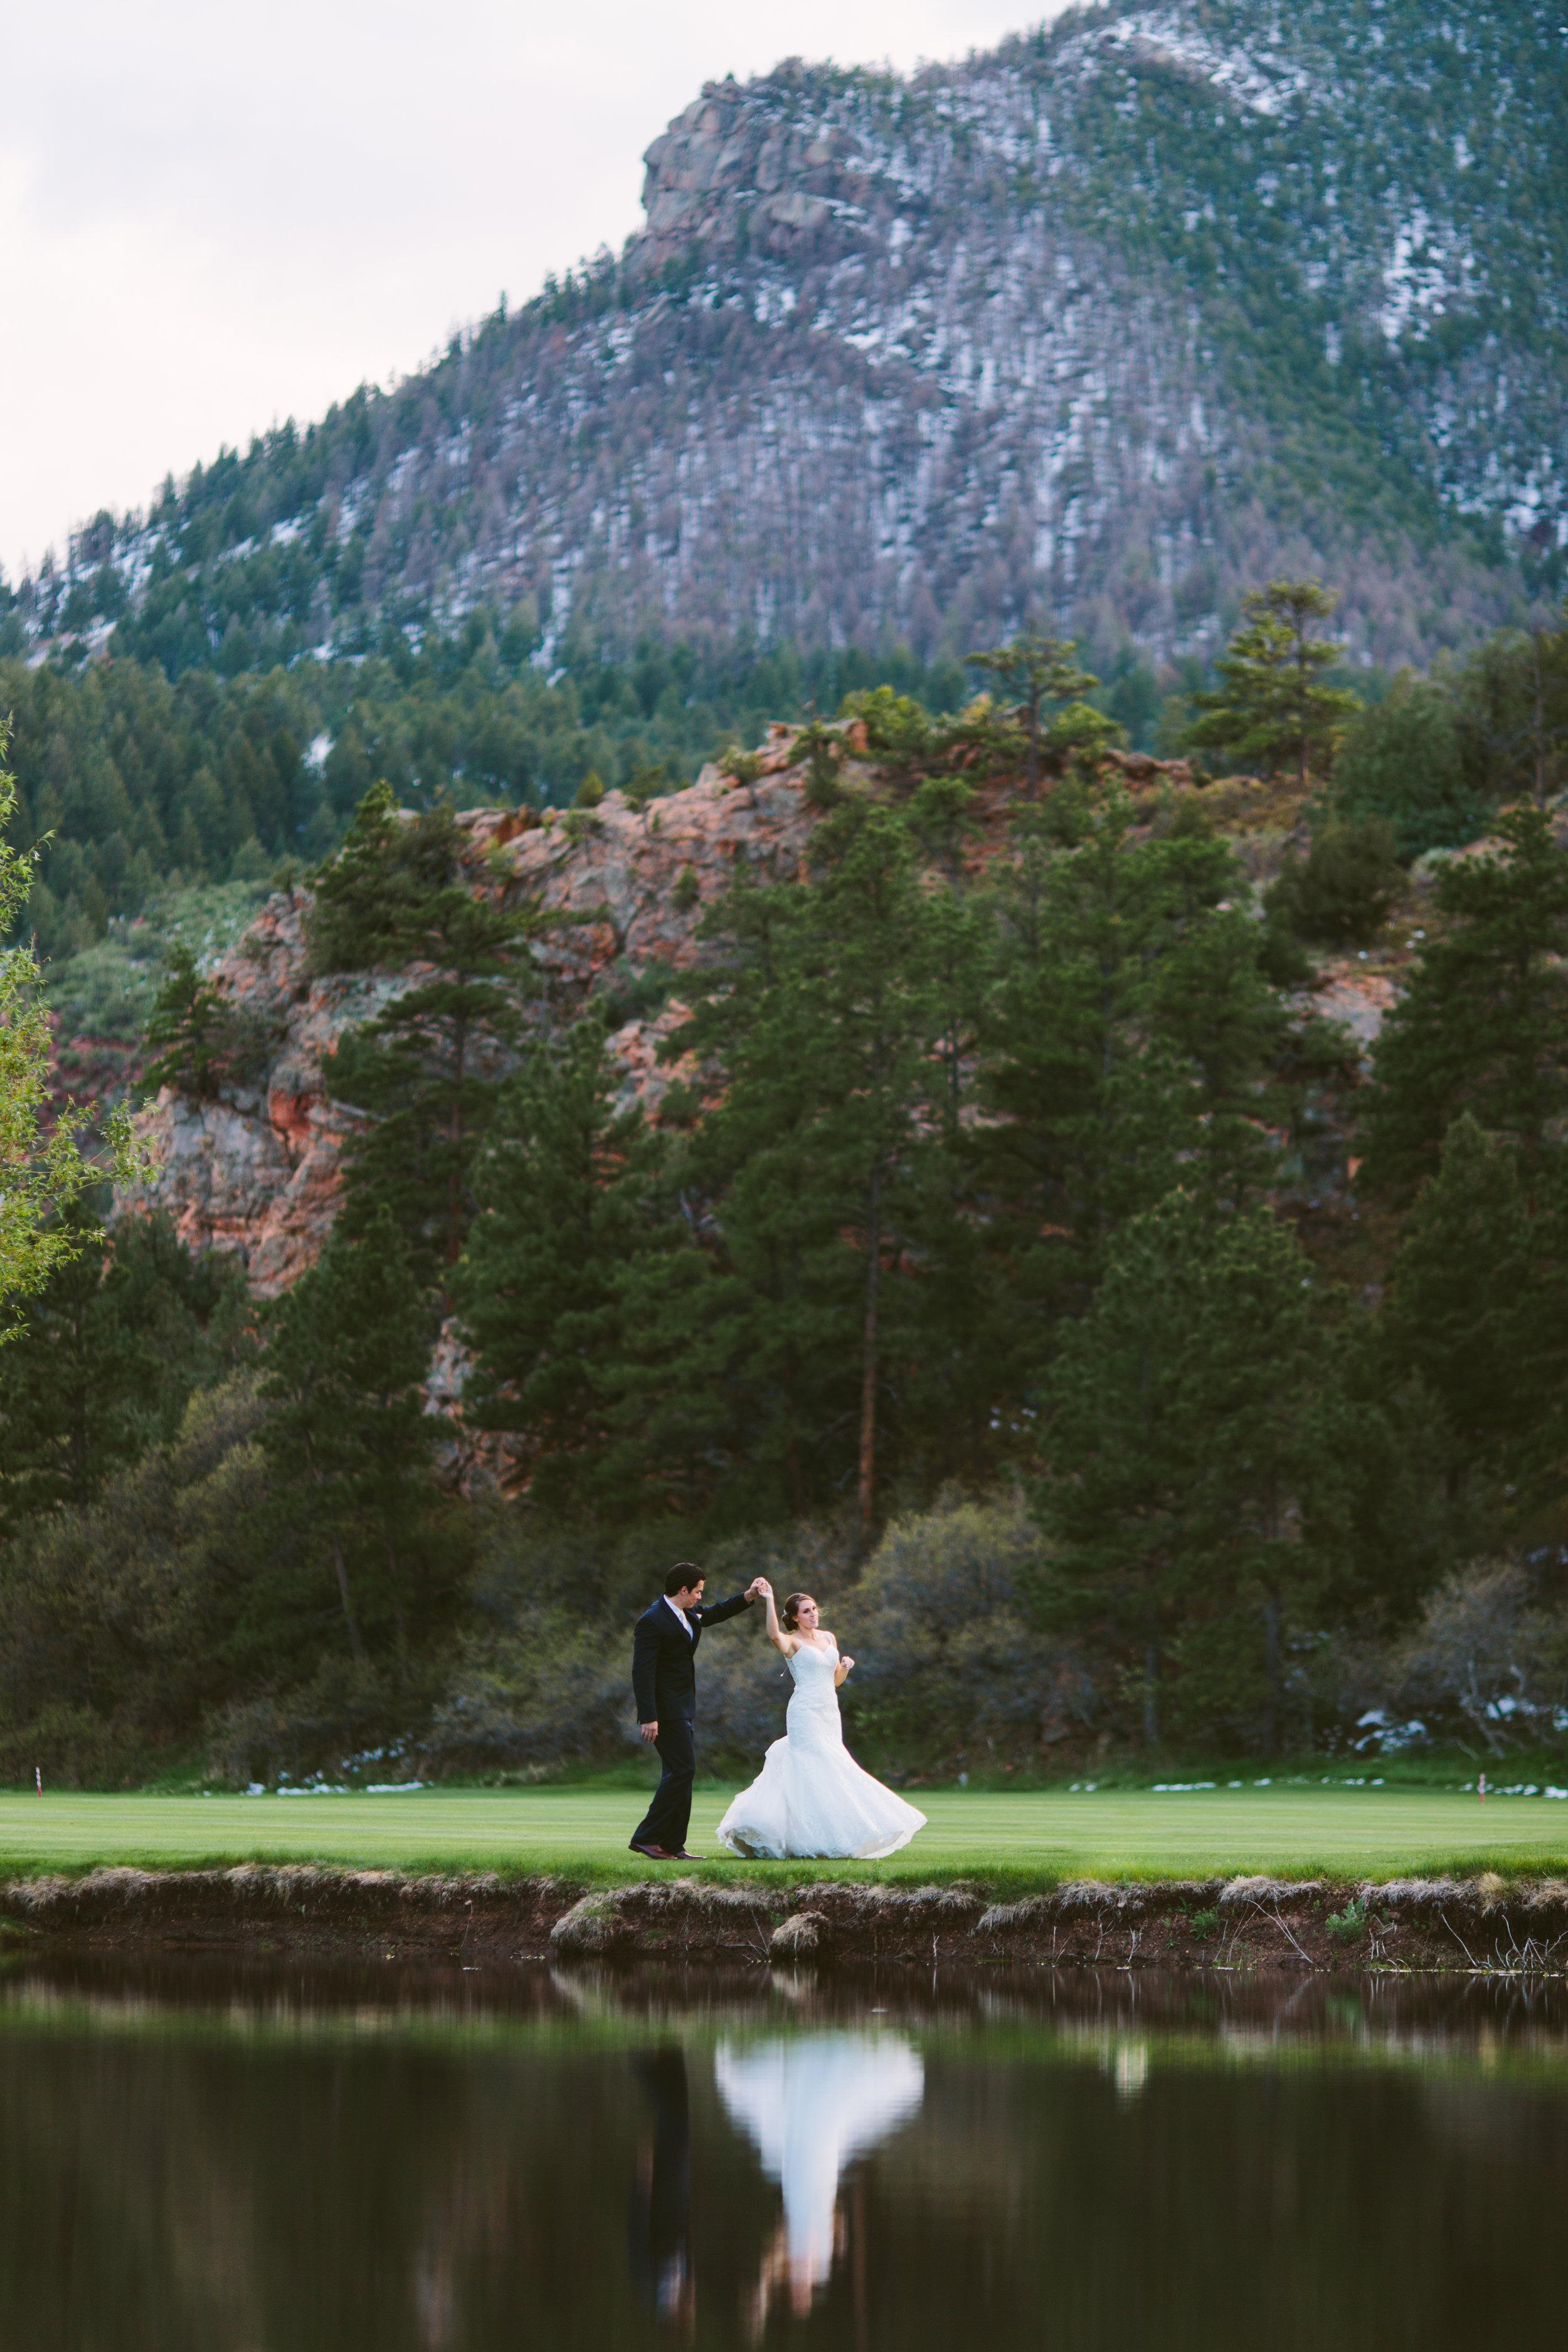 Jason & Micaela - Perry Park Country Club Wedding - Colorado Wedding Photographer-754.jpg